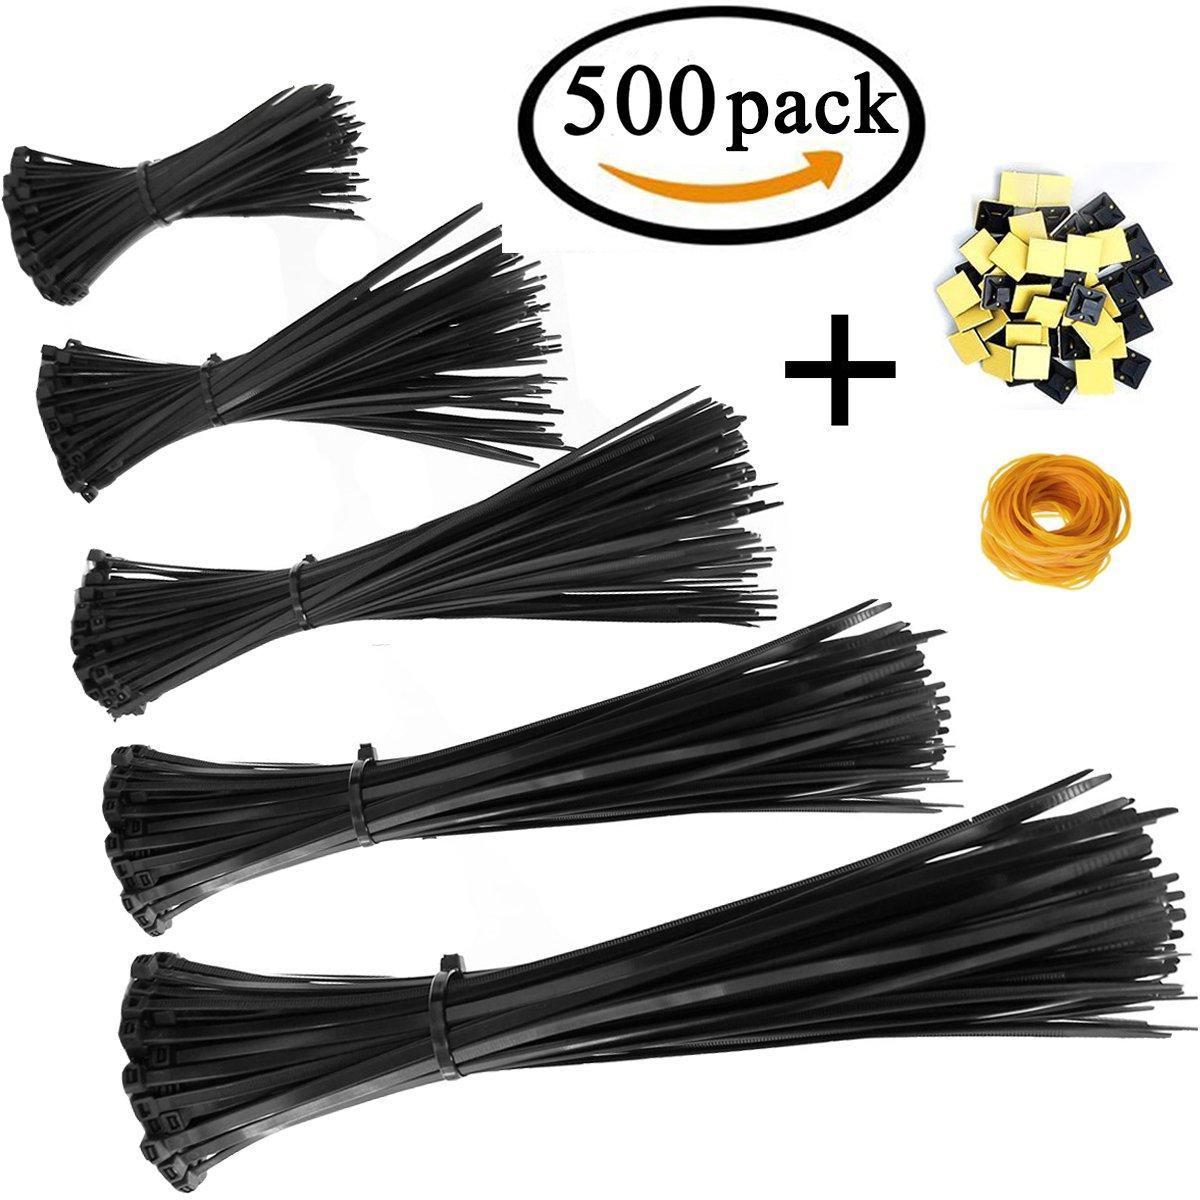 Honyear™ Zip Ties 500 Pcs Nylon Cable Zip Ties with Self-Locking 4/6/8/10/12 Inch, Black, UV Resistant, Heavy Duty